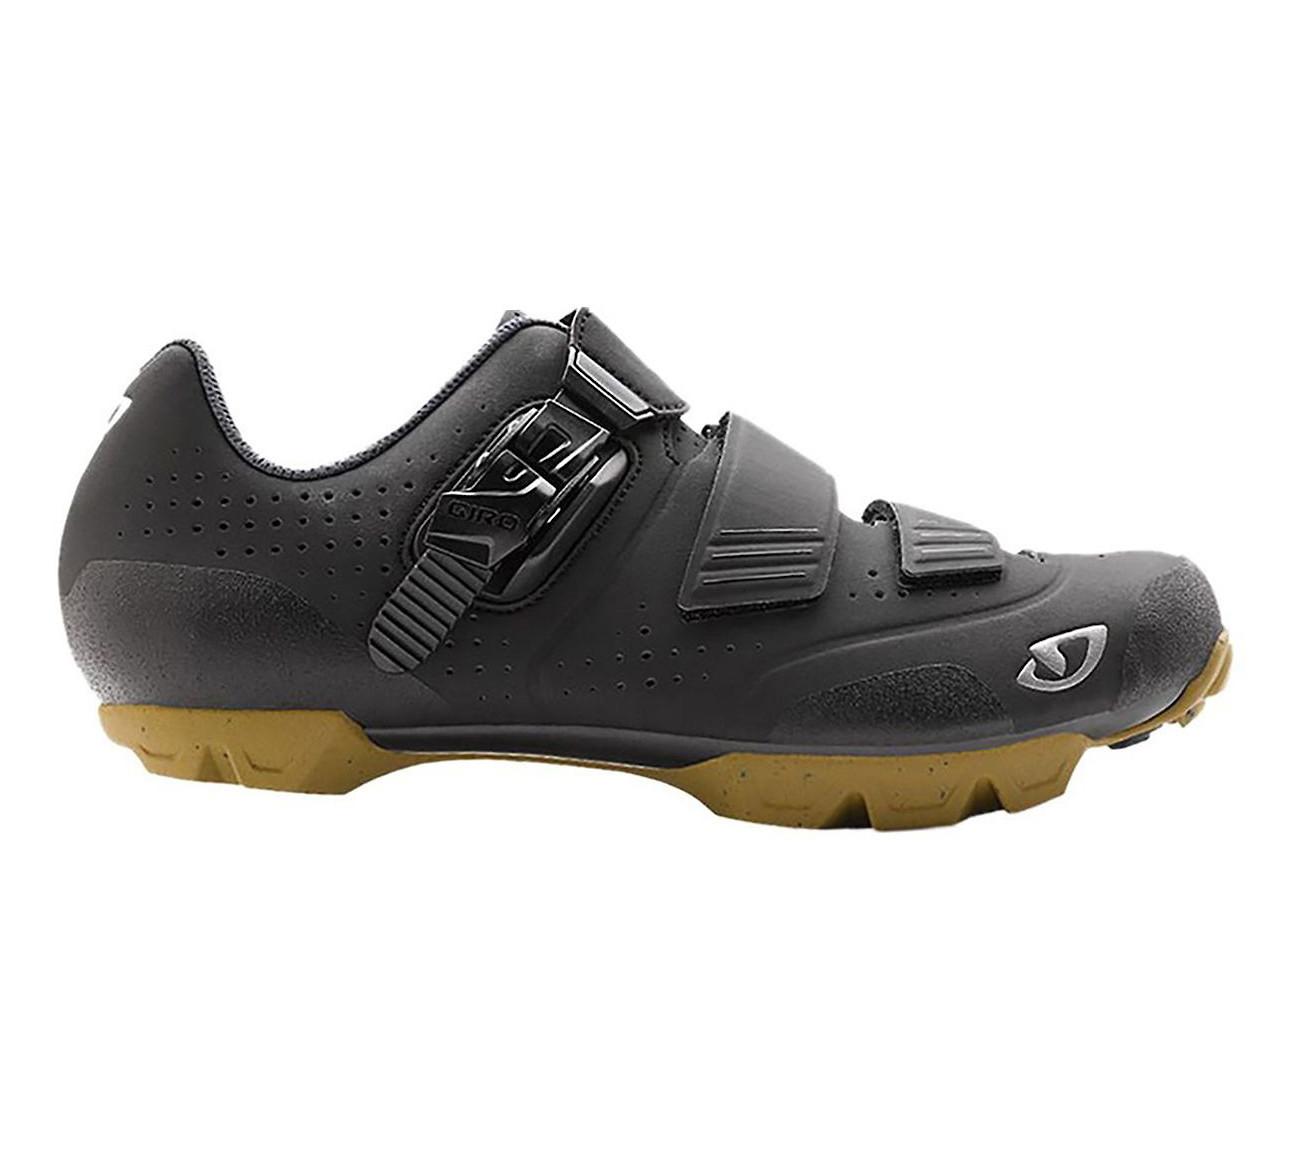 Giro Privateer R shoe in black-gum